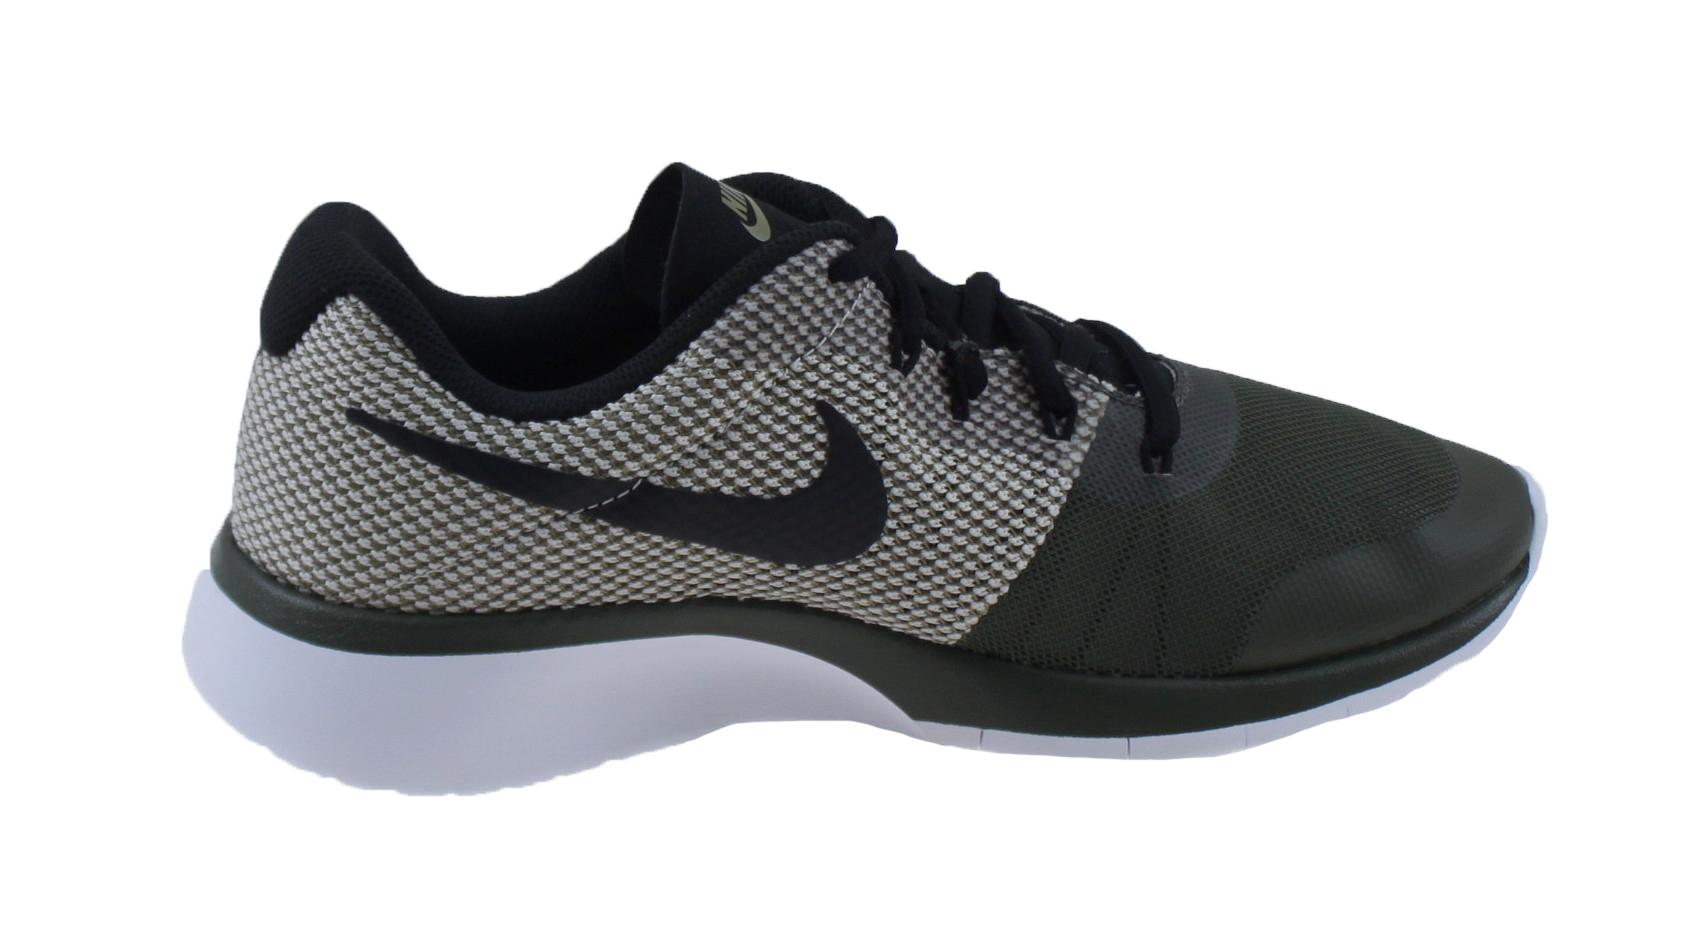 a3ace60de72 Nike TANJUN RACER (GS) GROEN online kopen bij Sportpaleis.